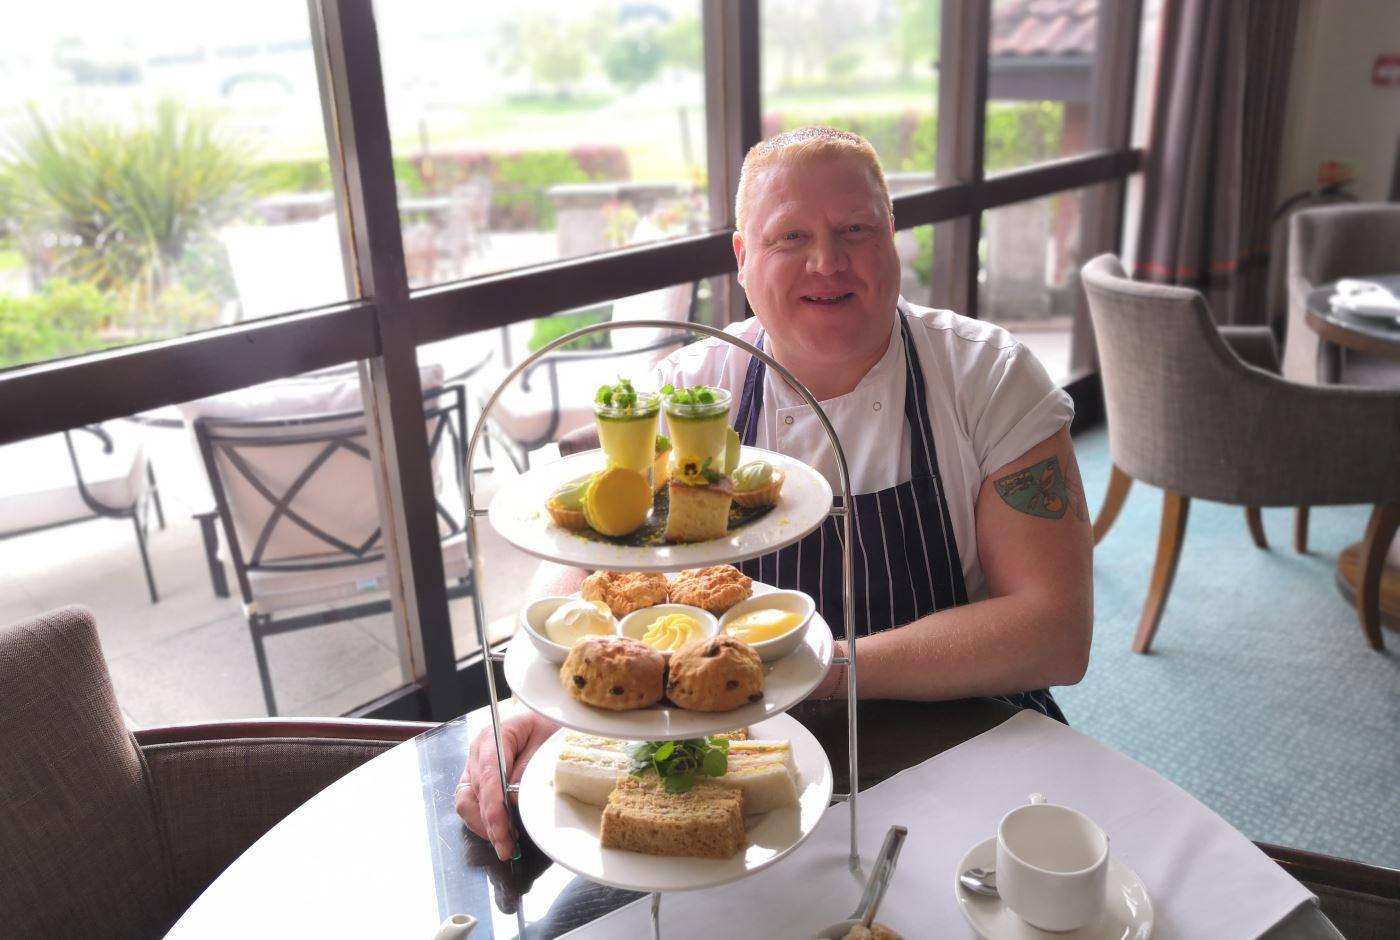 barnham broom chef with cakes